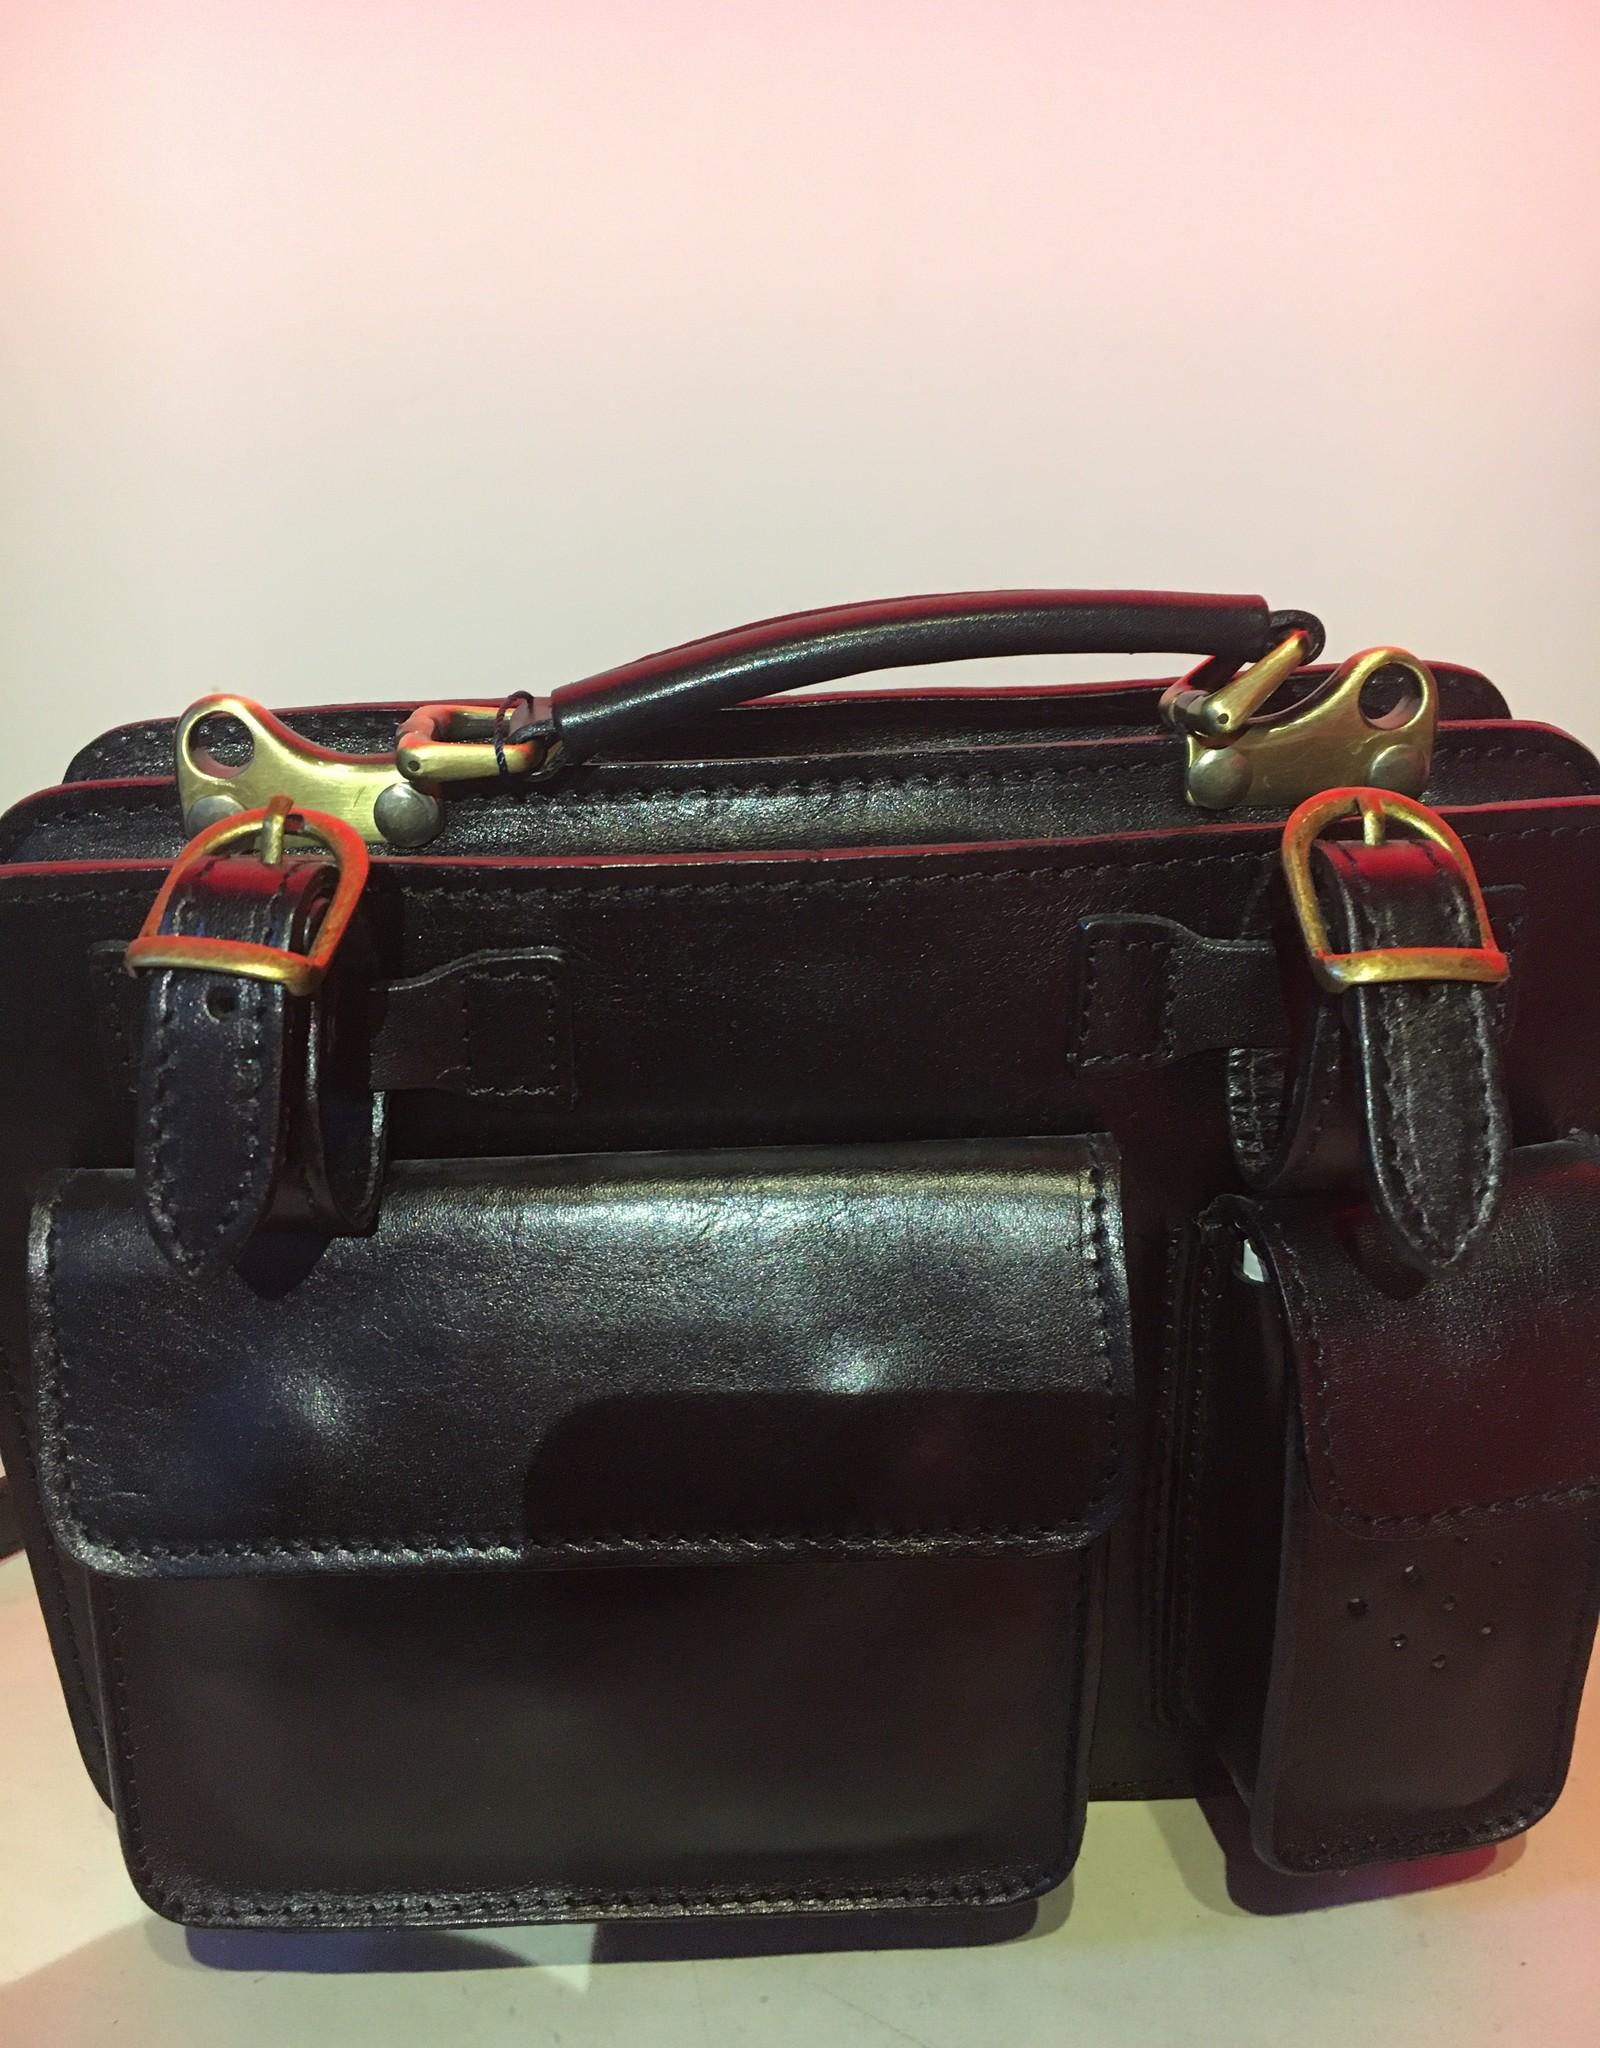 Giuliano Retro bag , real leather